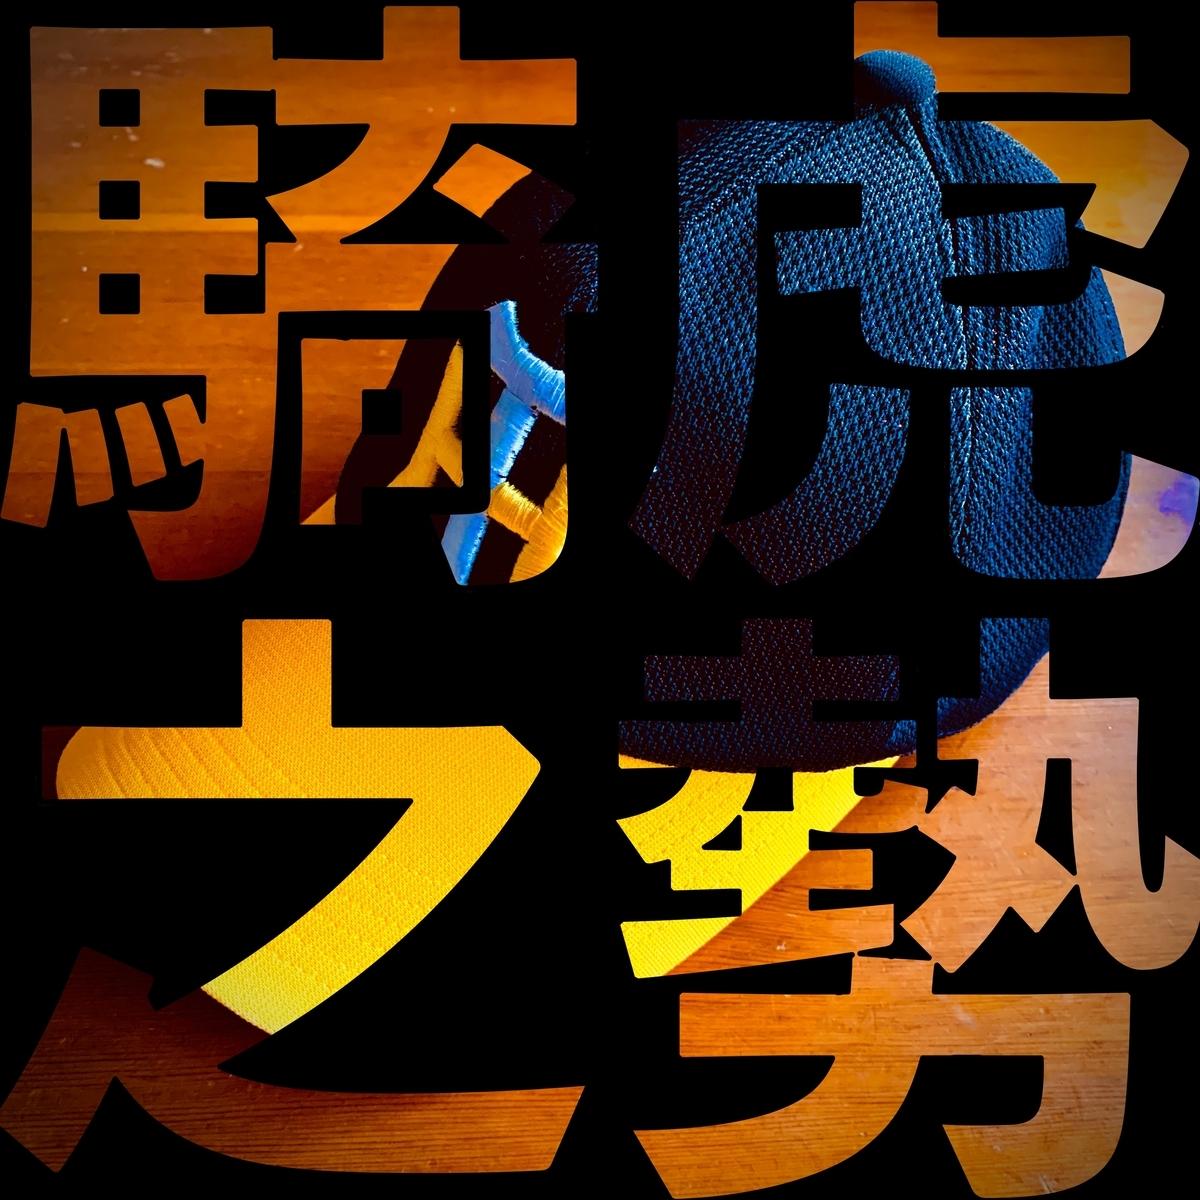 f:id:chobinosuke:20200929111655j:plain